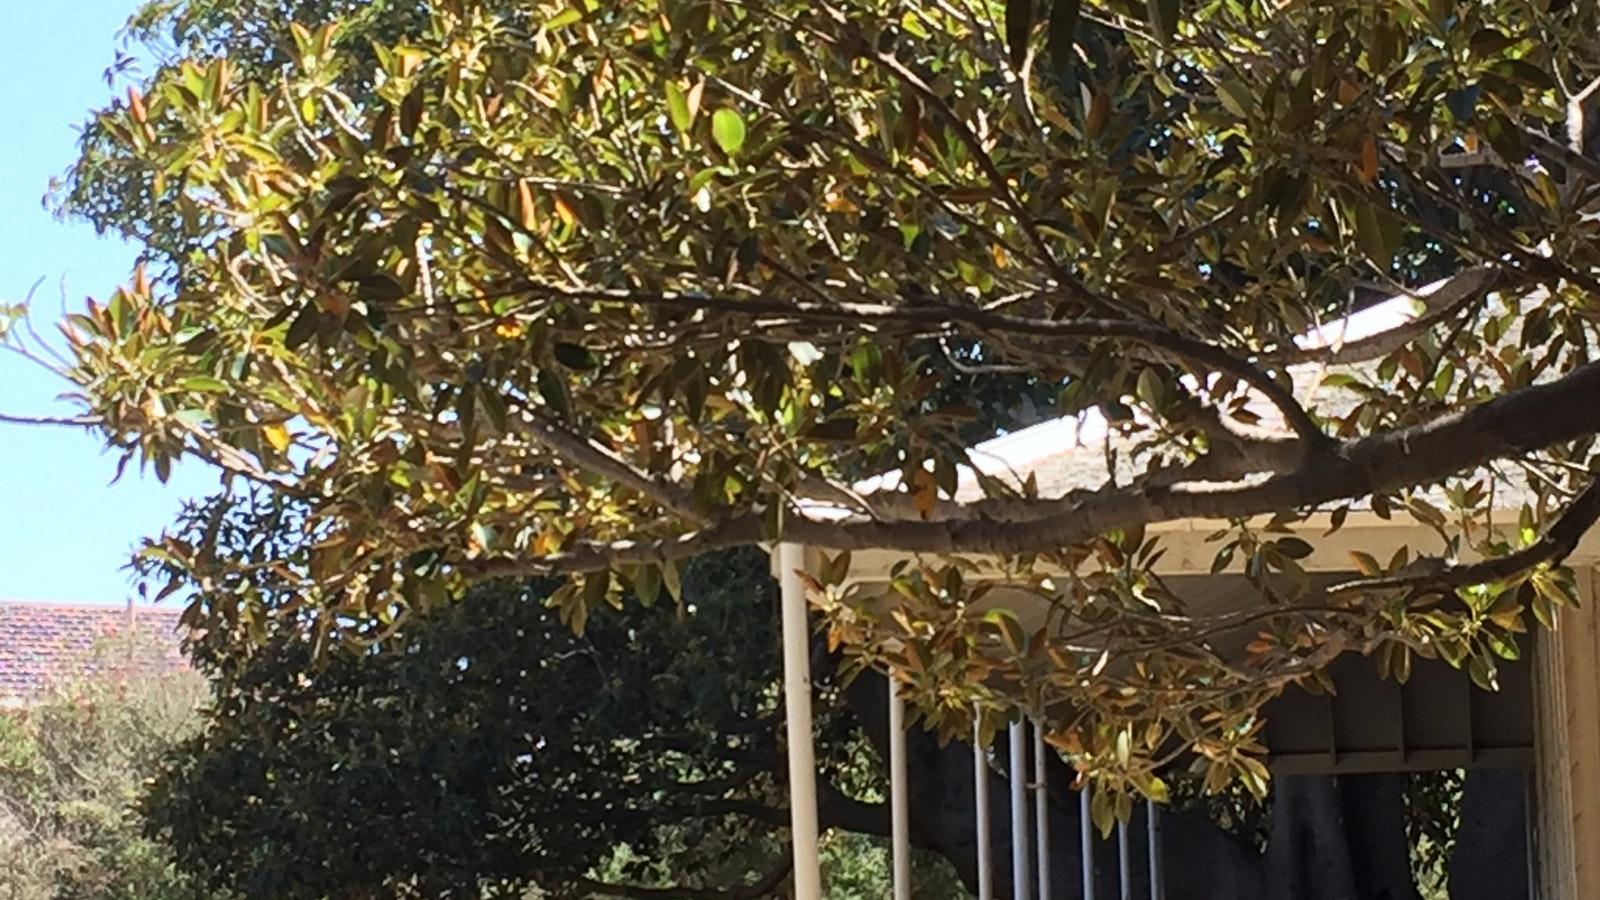 Moreton Bay Fig Tree at Black Rock House